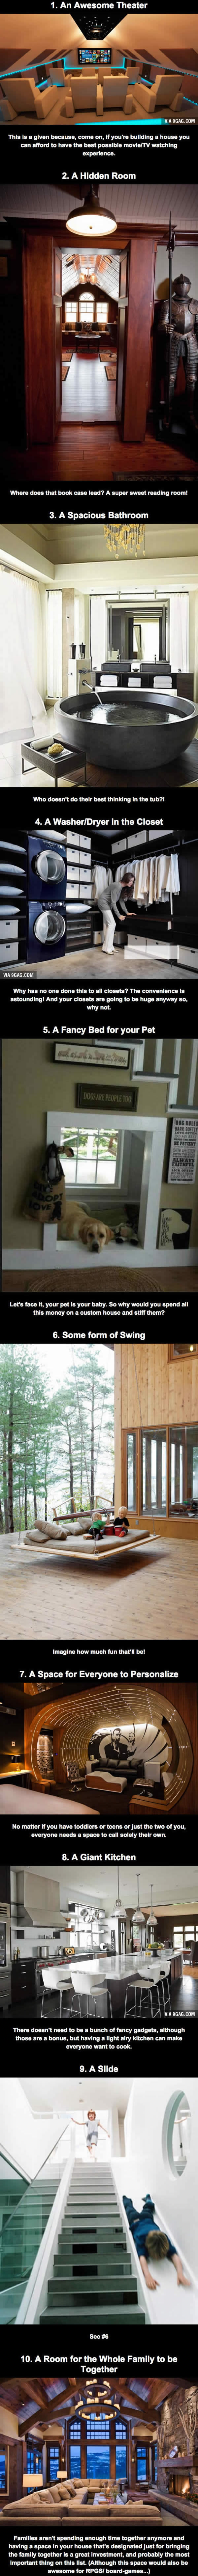 Things Every House Needs 10 things every custom built house needs - 9gag